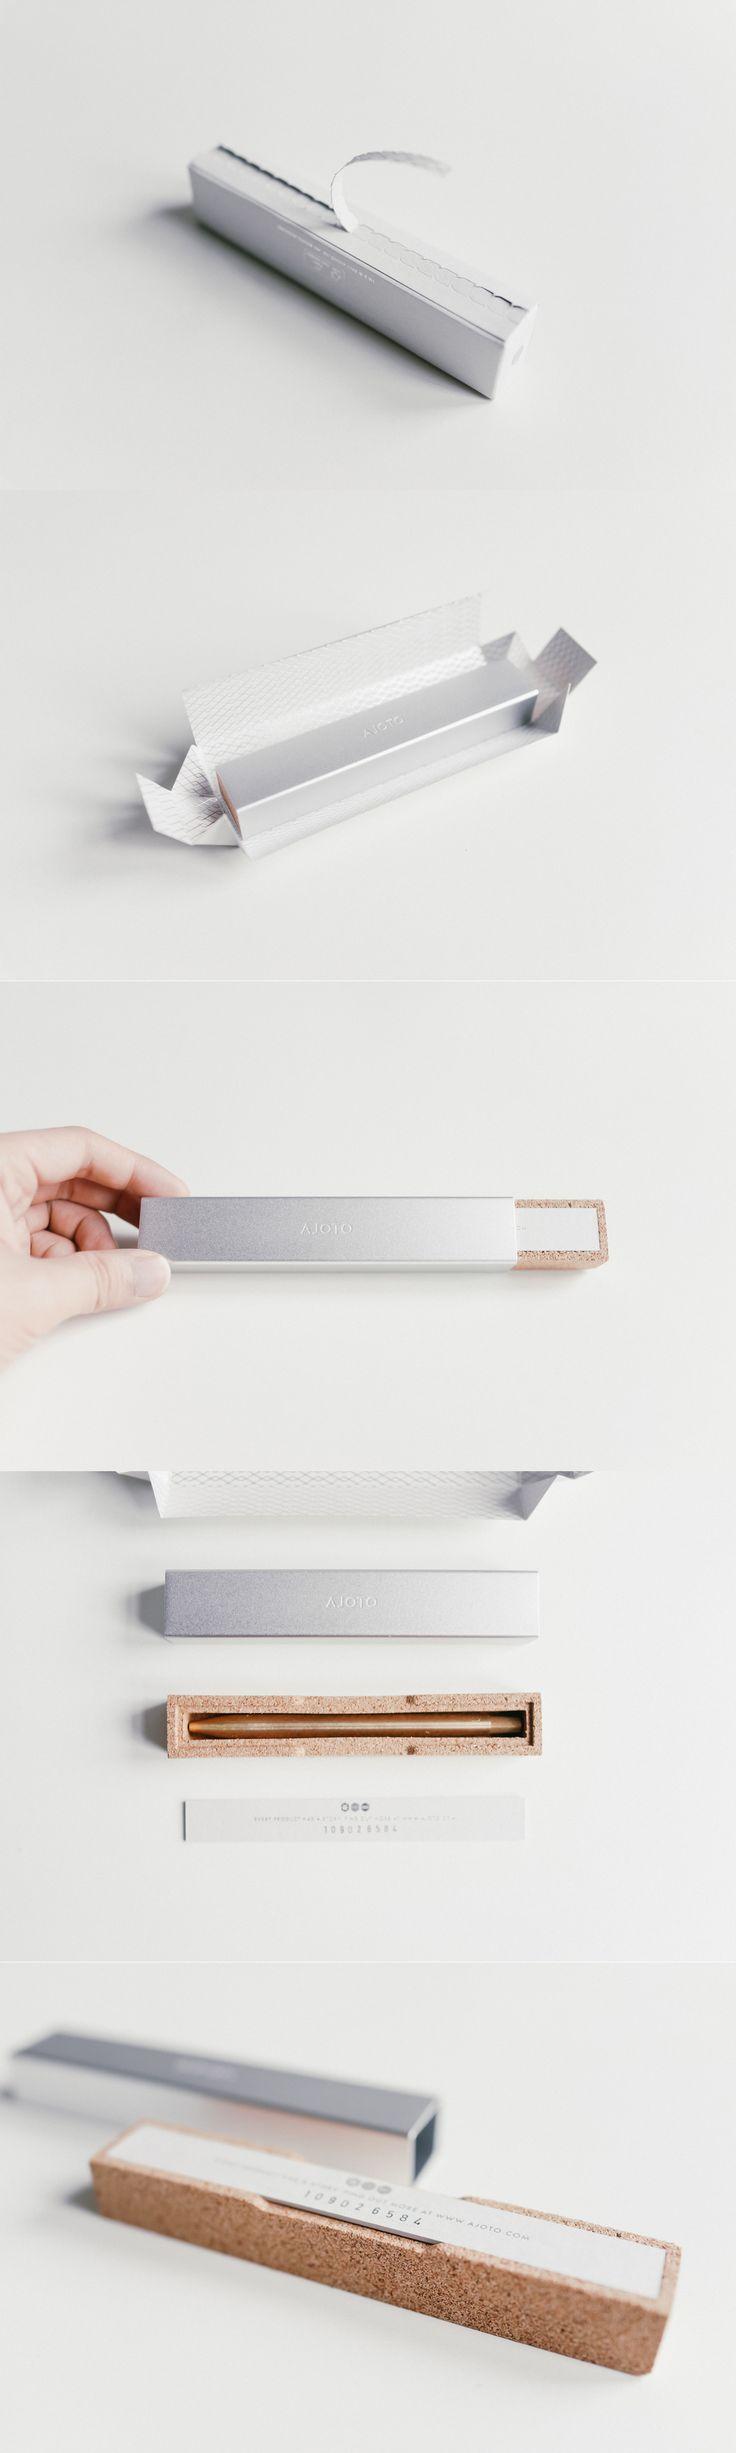 Ajoto. Minimalism with elegance. (More design inspiraiton at www.aldenchong.com)